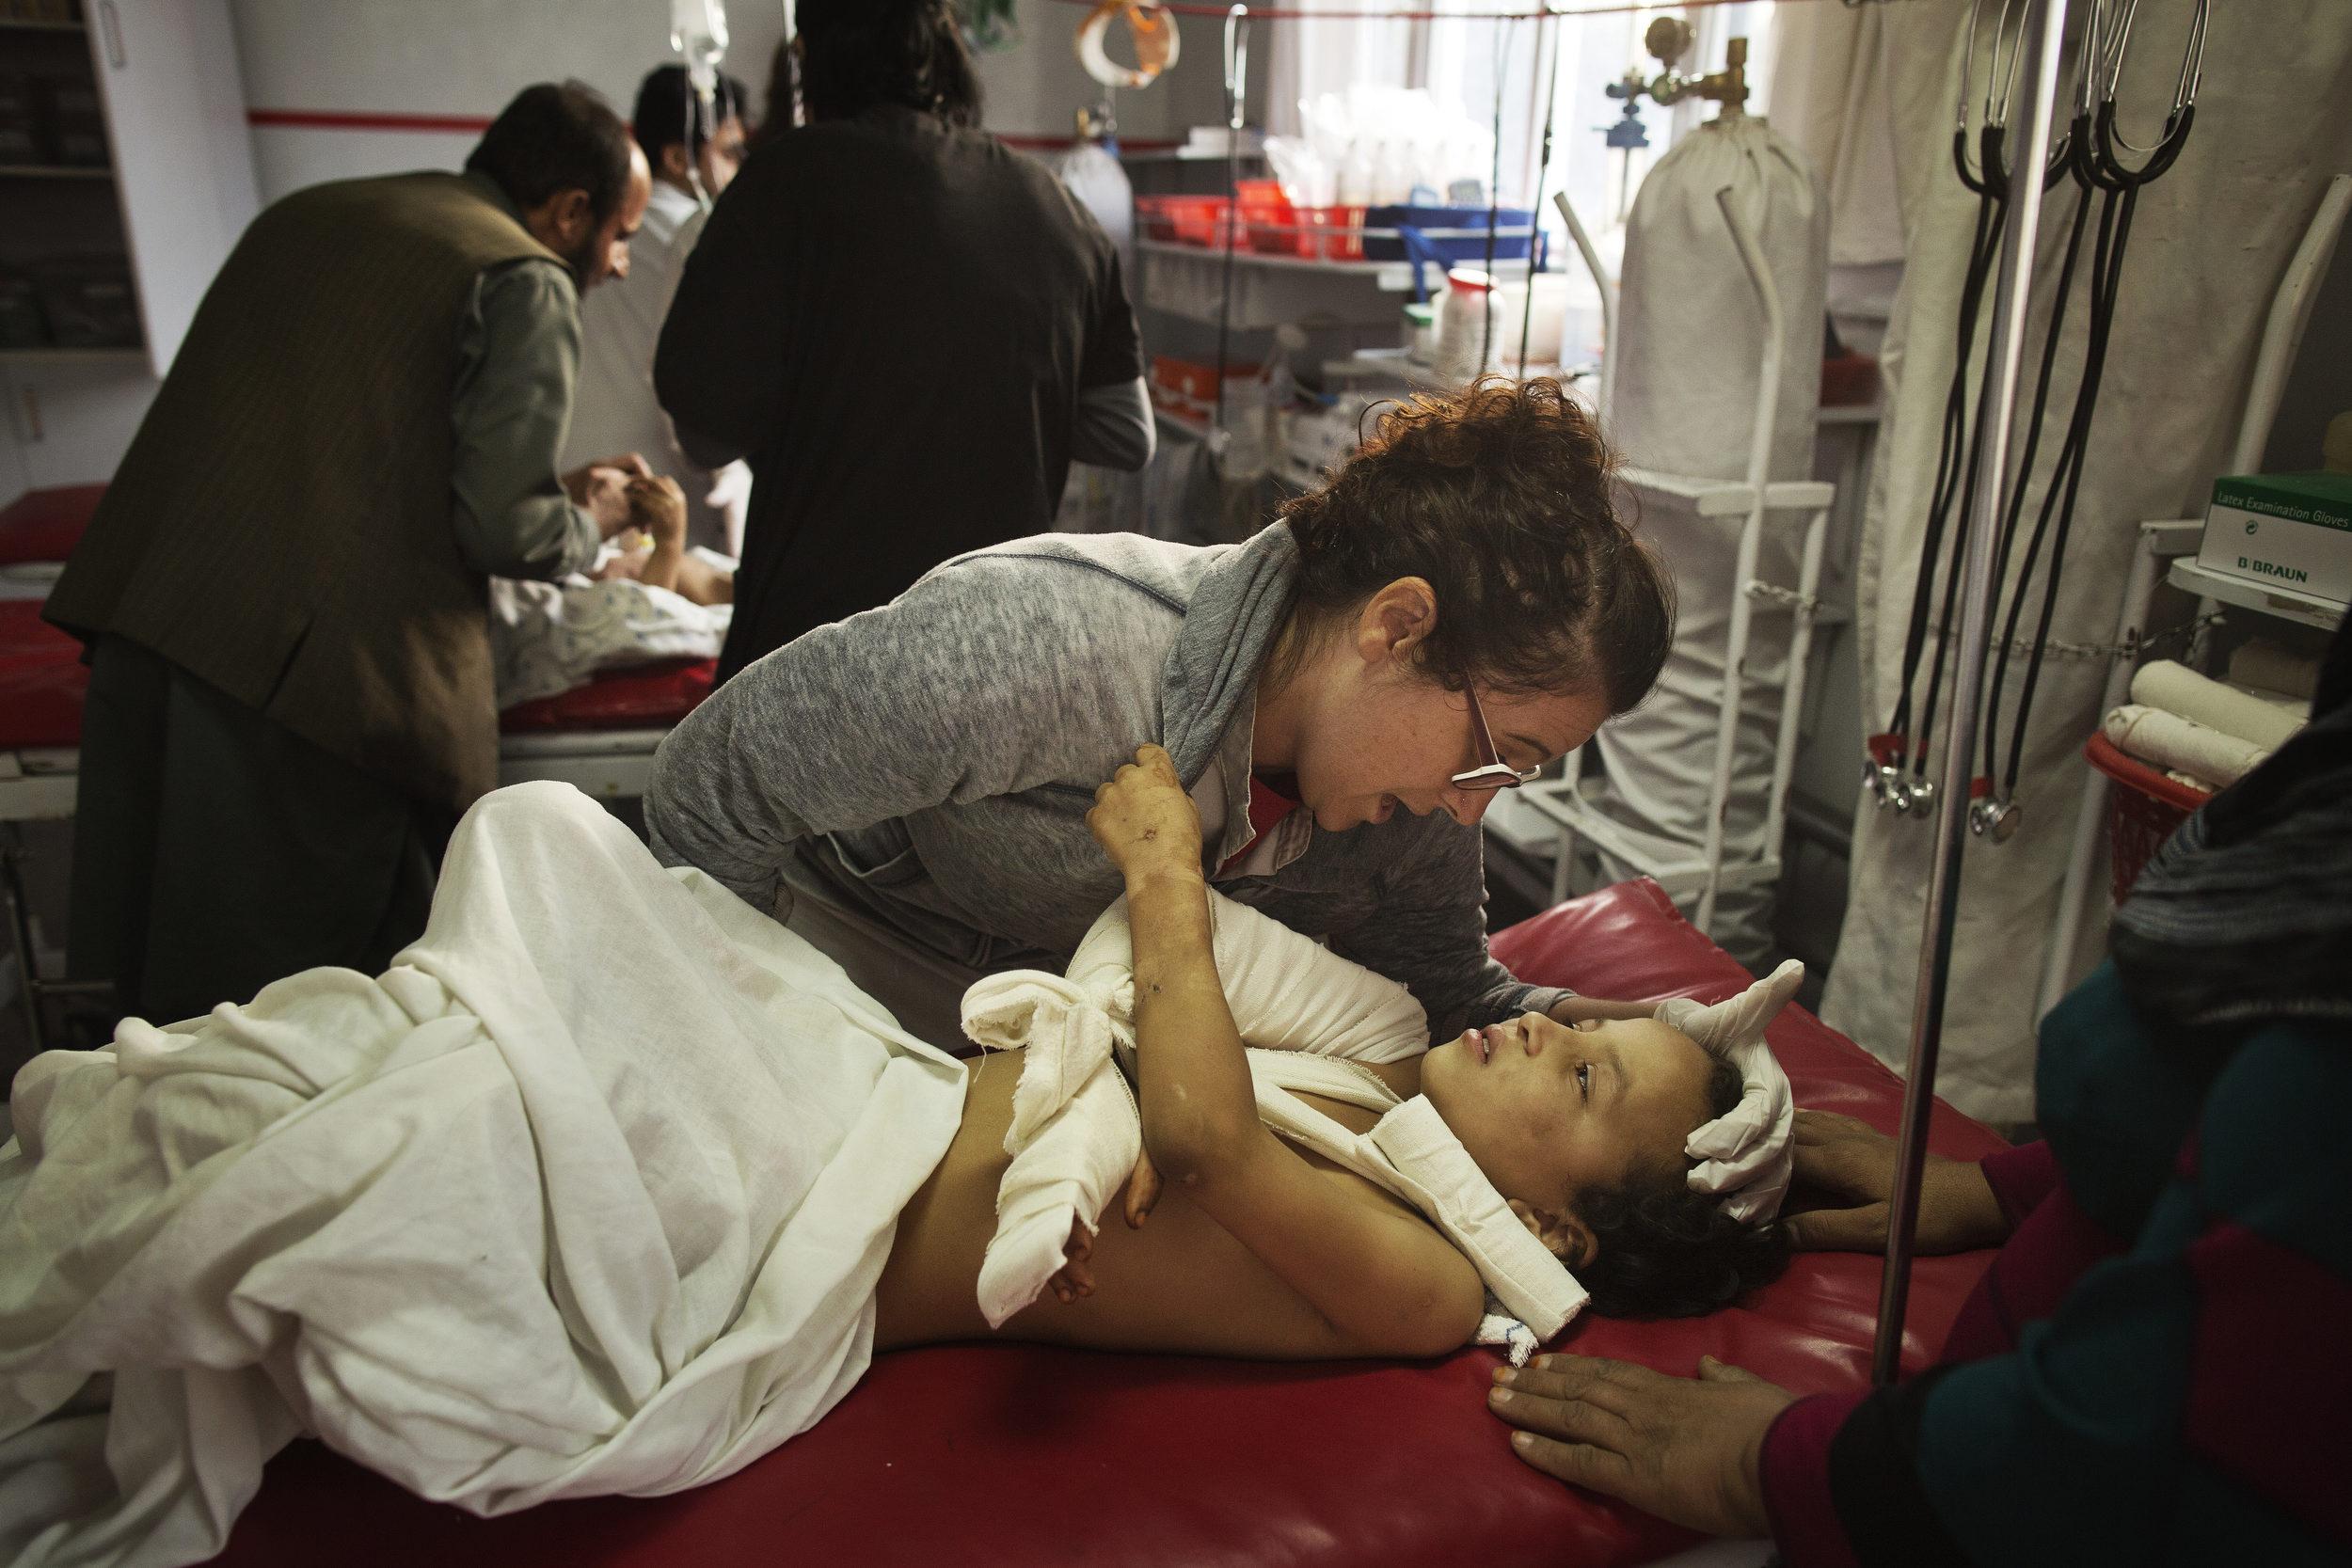 Nurse Georgia Novello comforts Madina, 8, injured in the US airstrike on the MSF hospital in Kunduz and evacuated to Kabul.